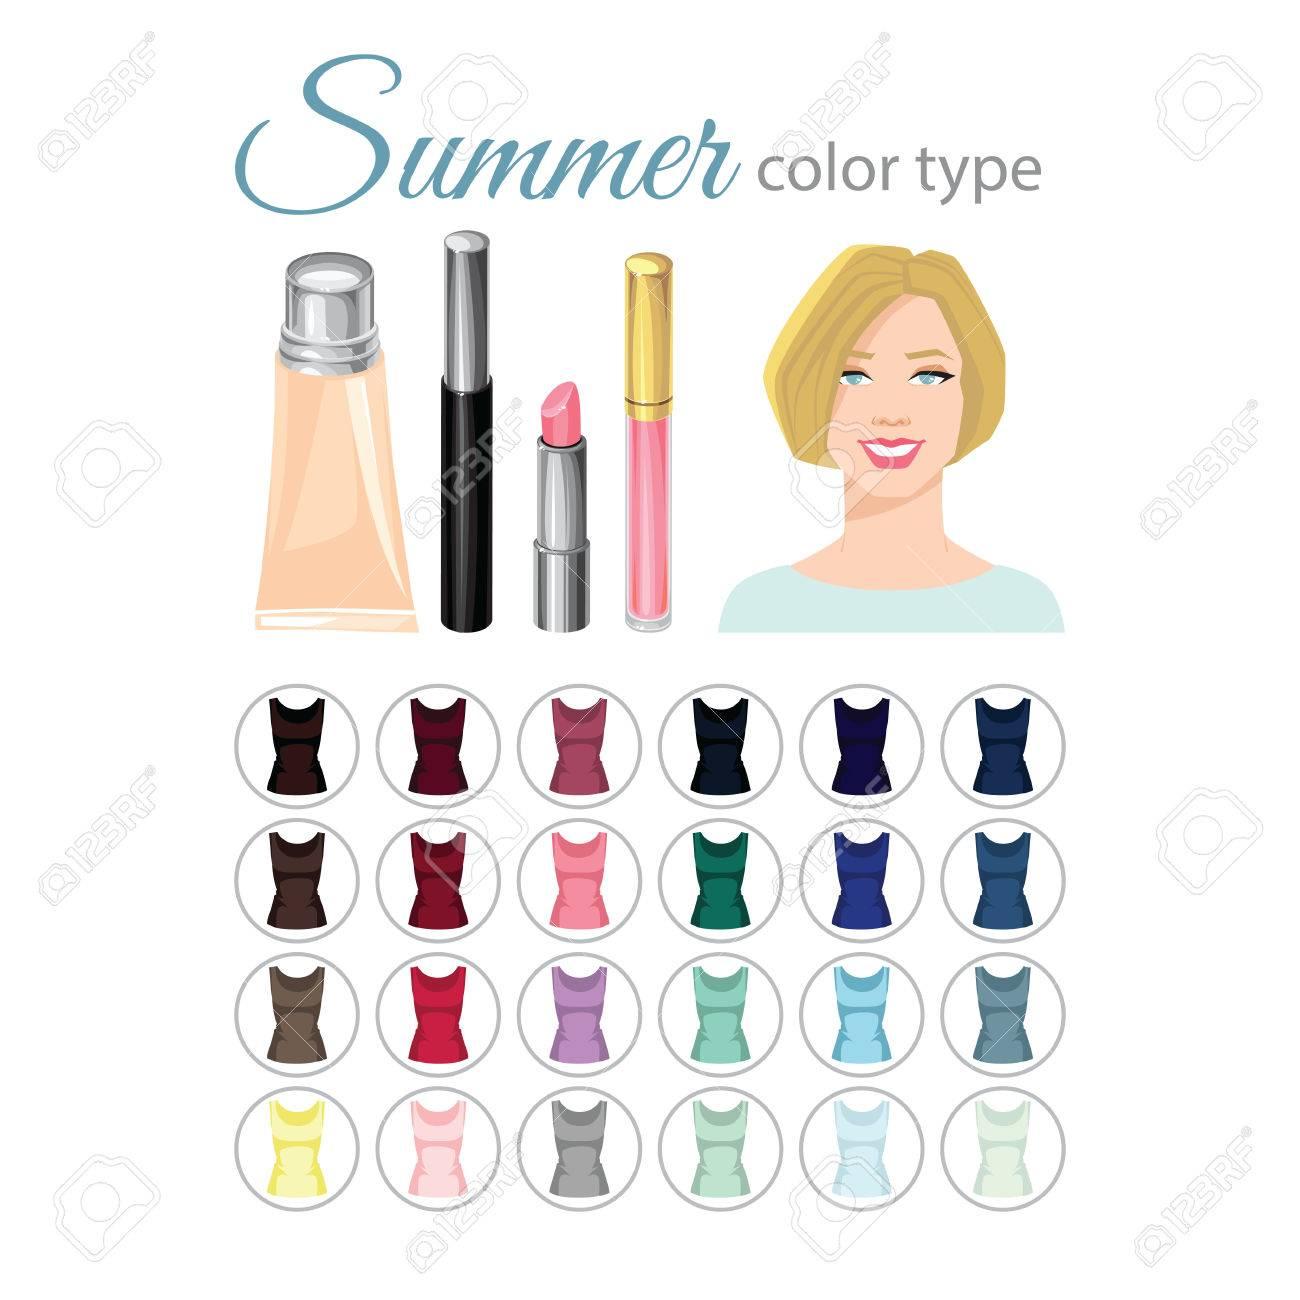 Vektor Illustration Der Saisonalen Farbpalette Fur Den Sommer Typ